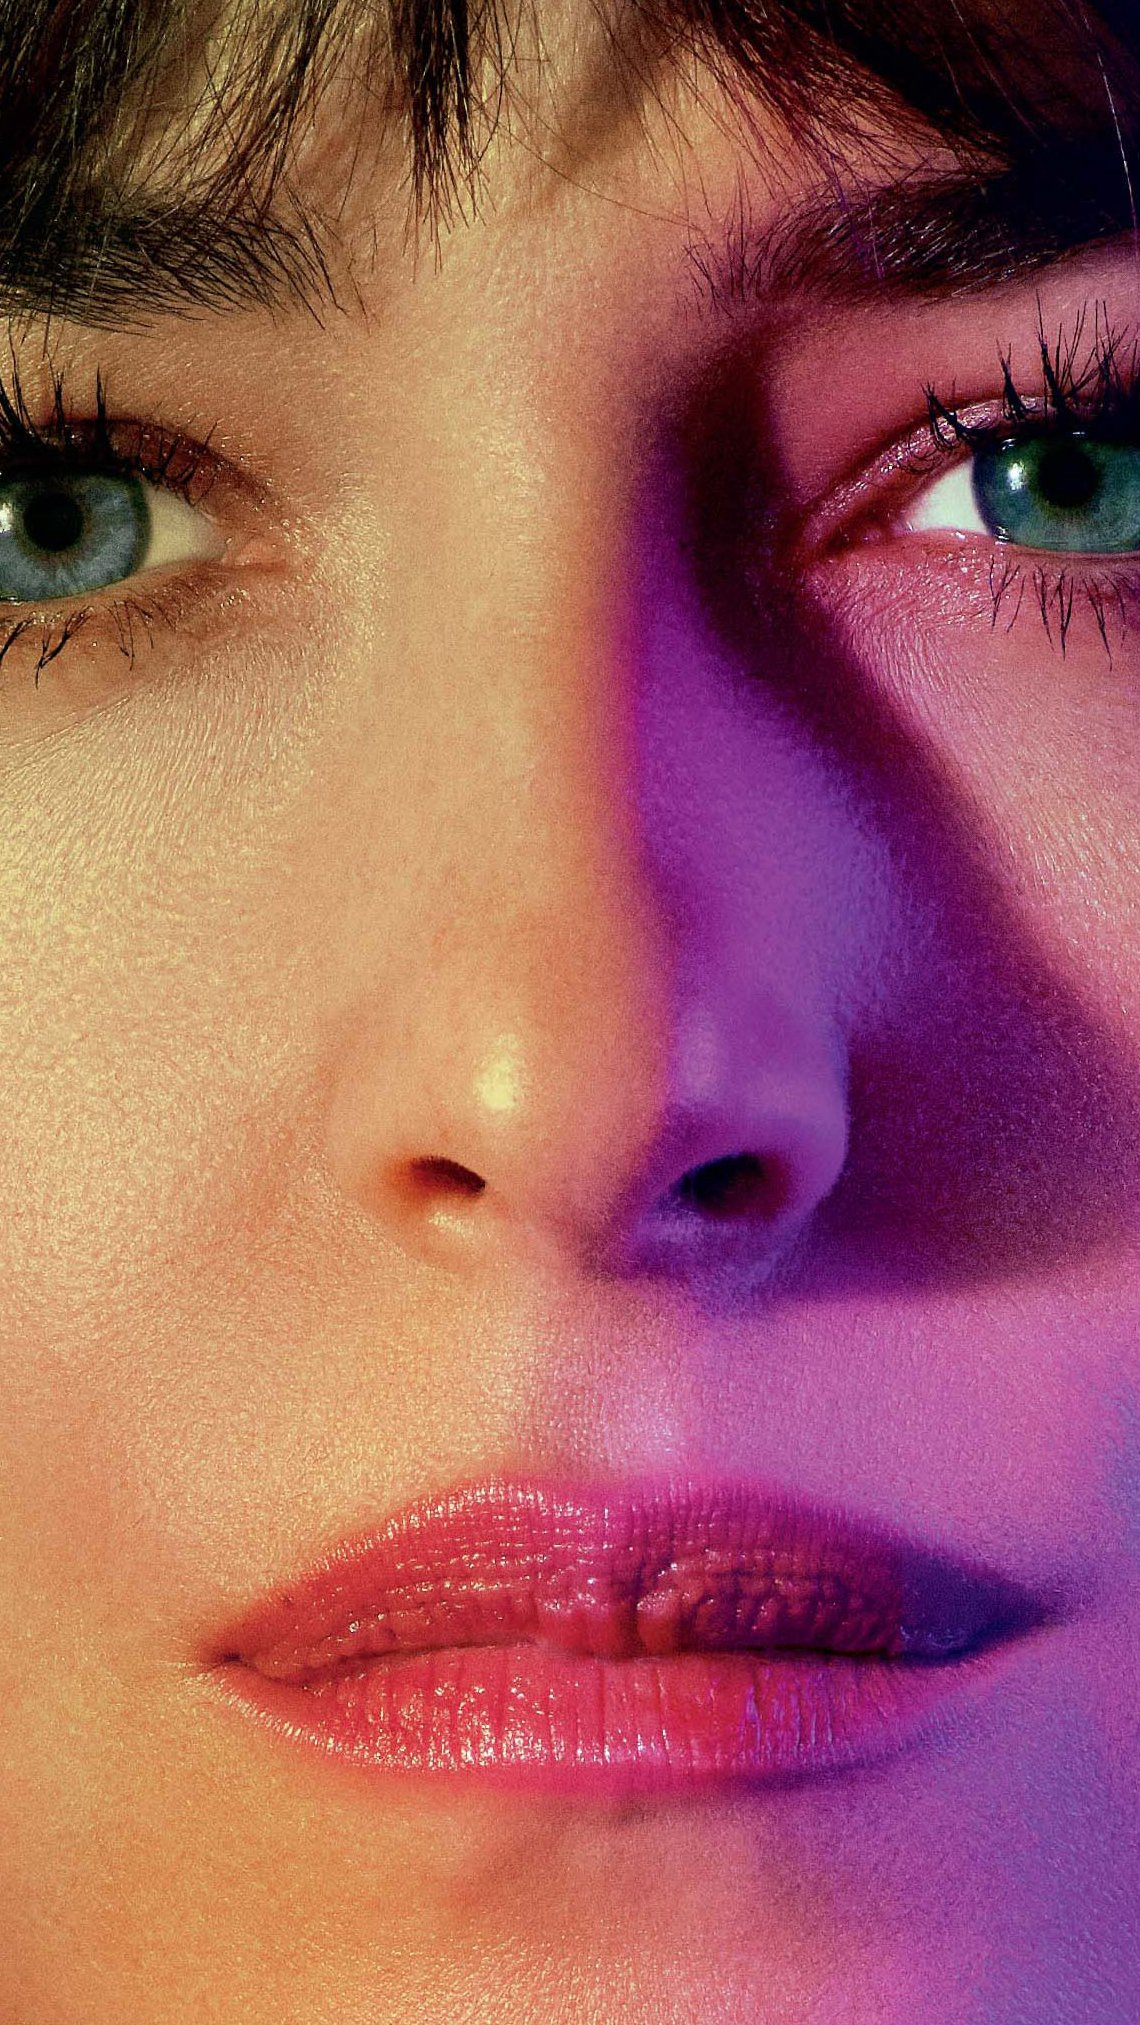 Fondos de pantalla Dakota Johnson en Malos momentos en el Hotel Royale Vertical